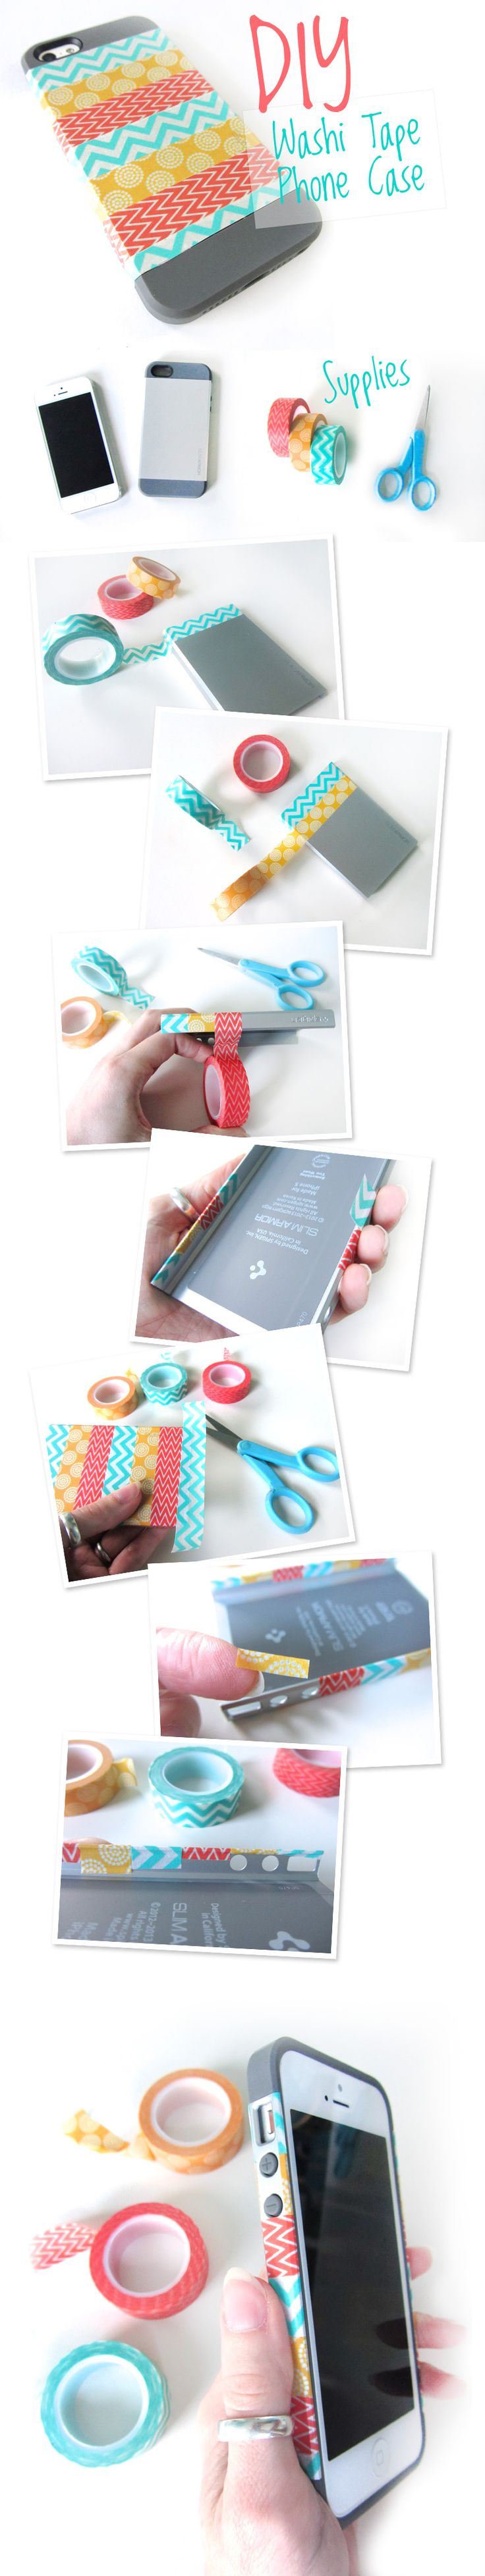 Diy washi tape phone case decor crafts diy pinterest for Washi tape phone case